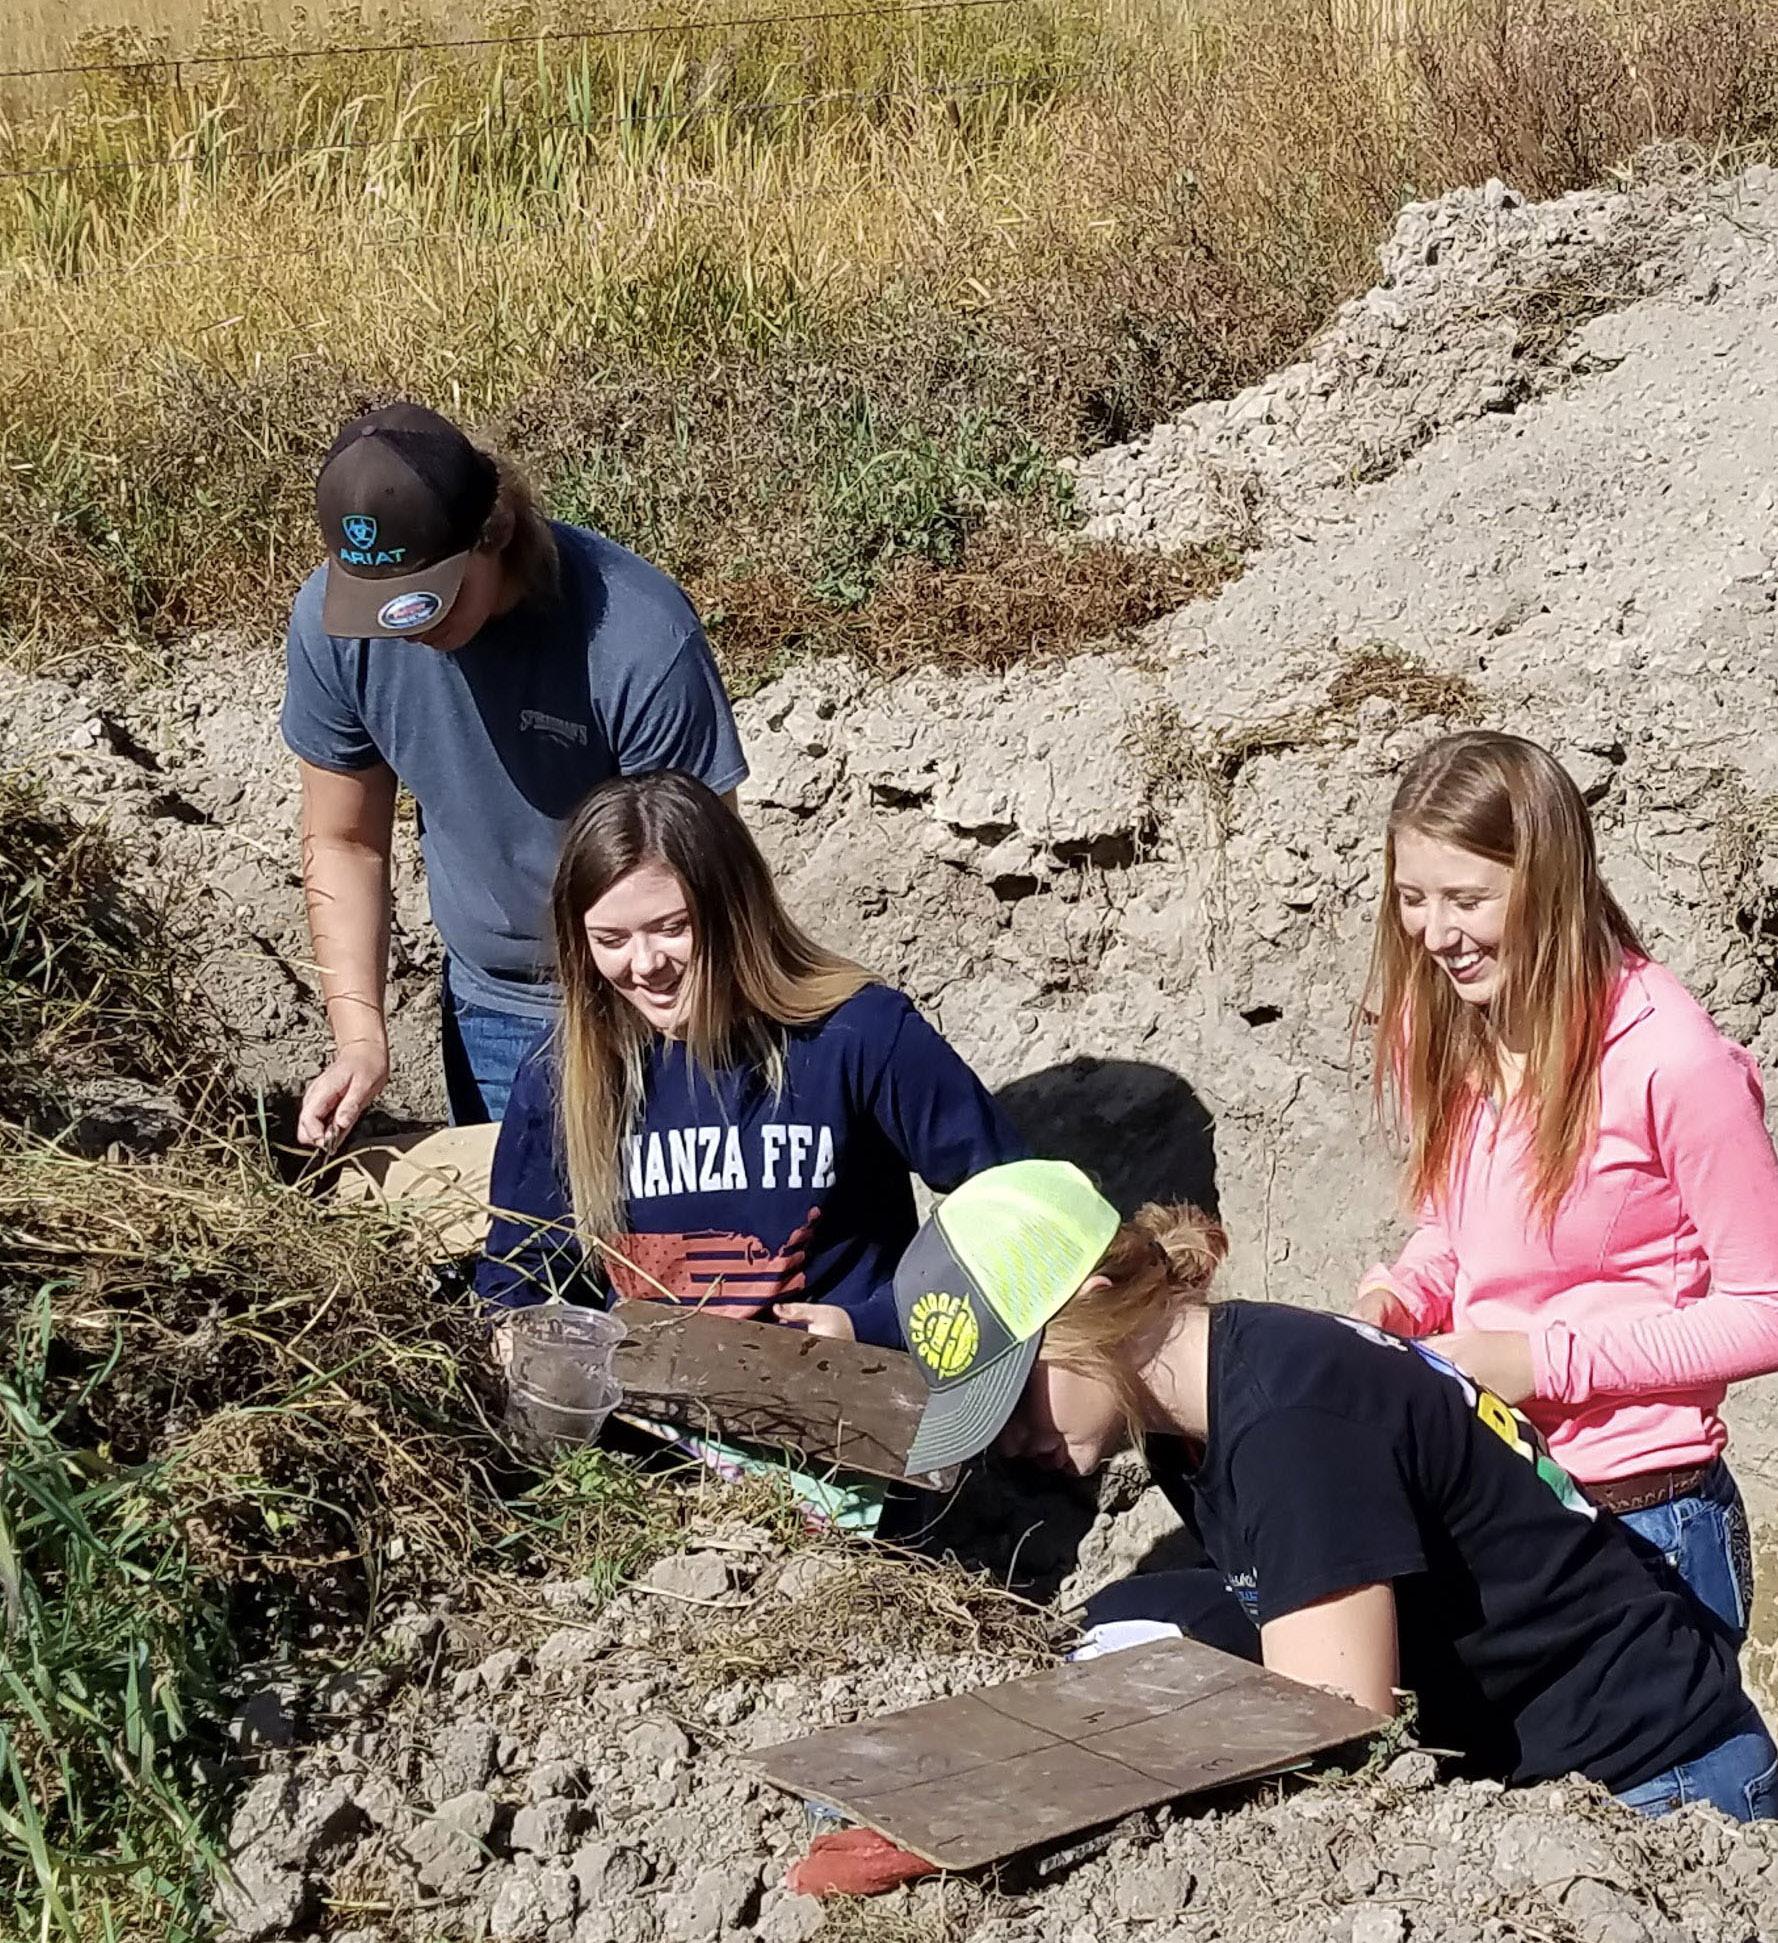 Bonanza FFA members Erik Petersen, Morgan Pitcock, Kailyn Nichols and Barbara Velik extract soil samples from each horizon at the Southern Oregon District Soils Evaluation CDE.